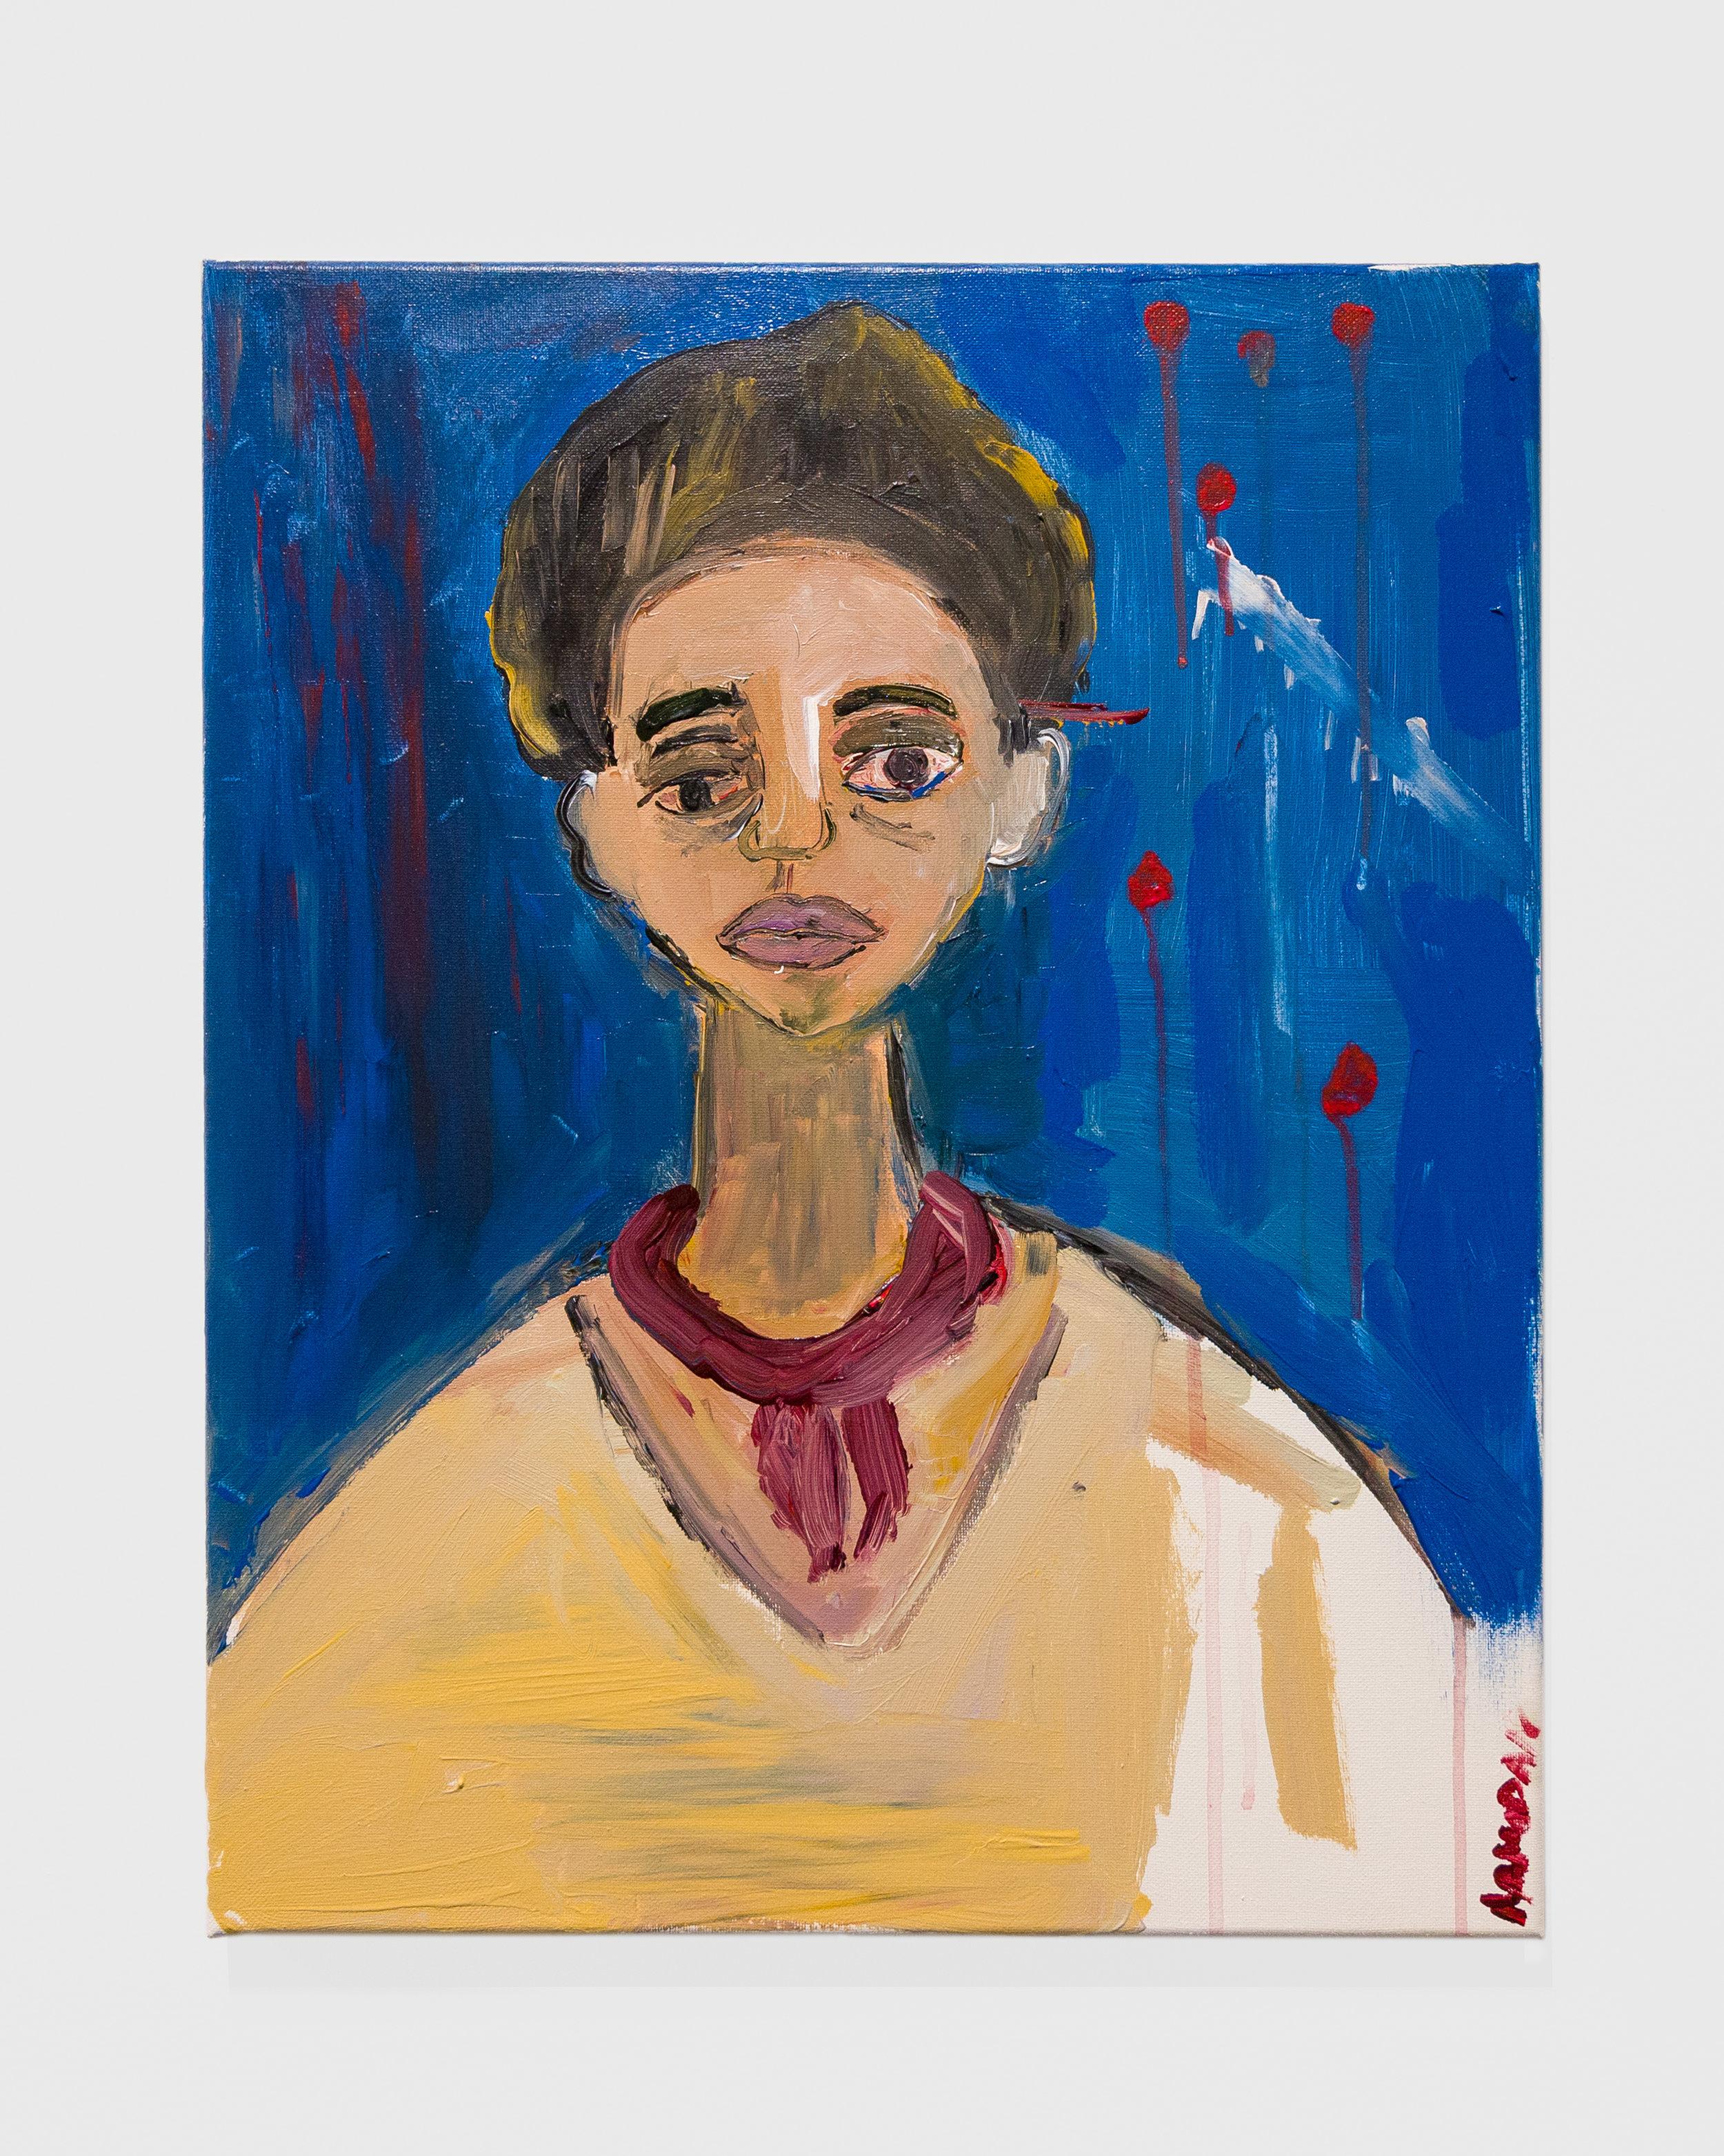 Cassi Namoda  -  2am at Cedar-Sinai , 2018 Acrylic on canvas 20h x 16w inches